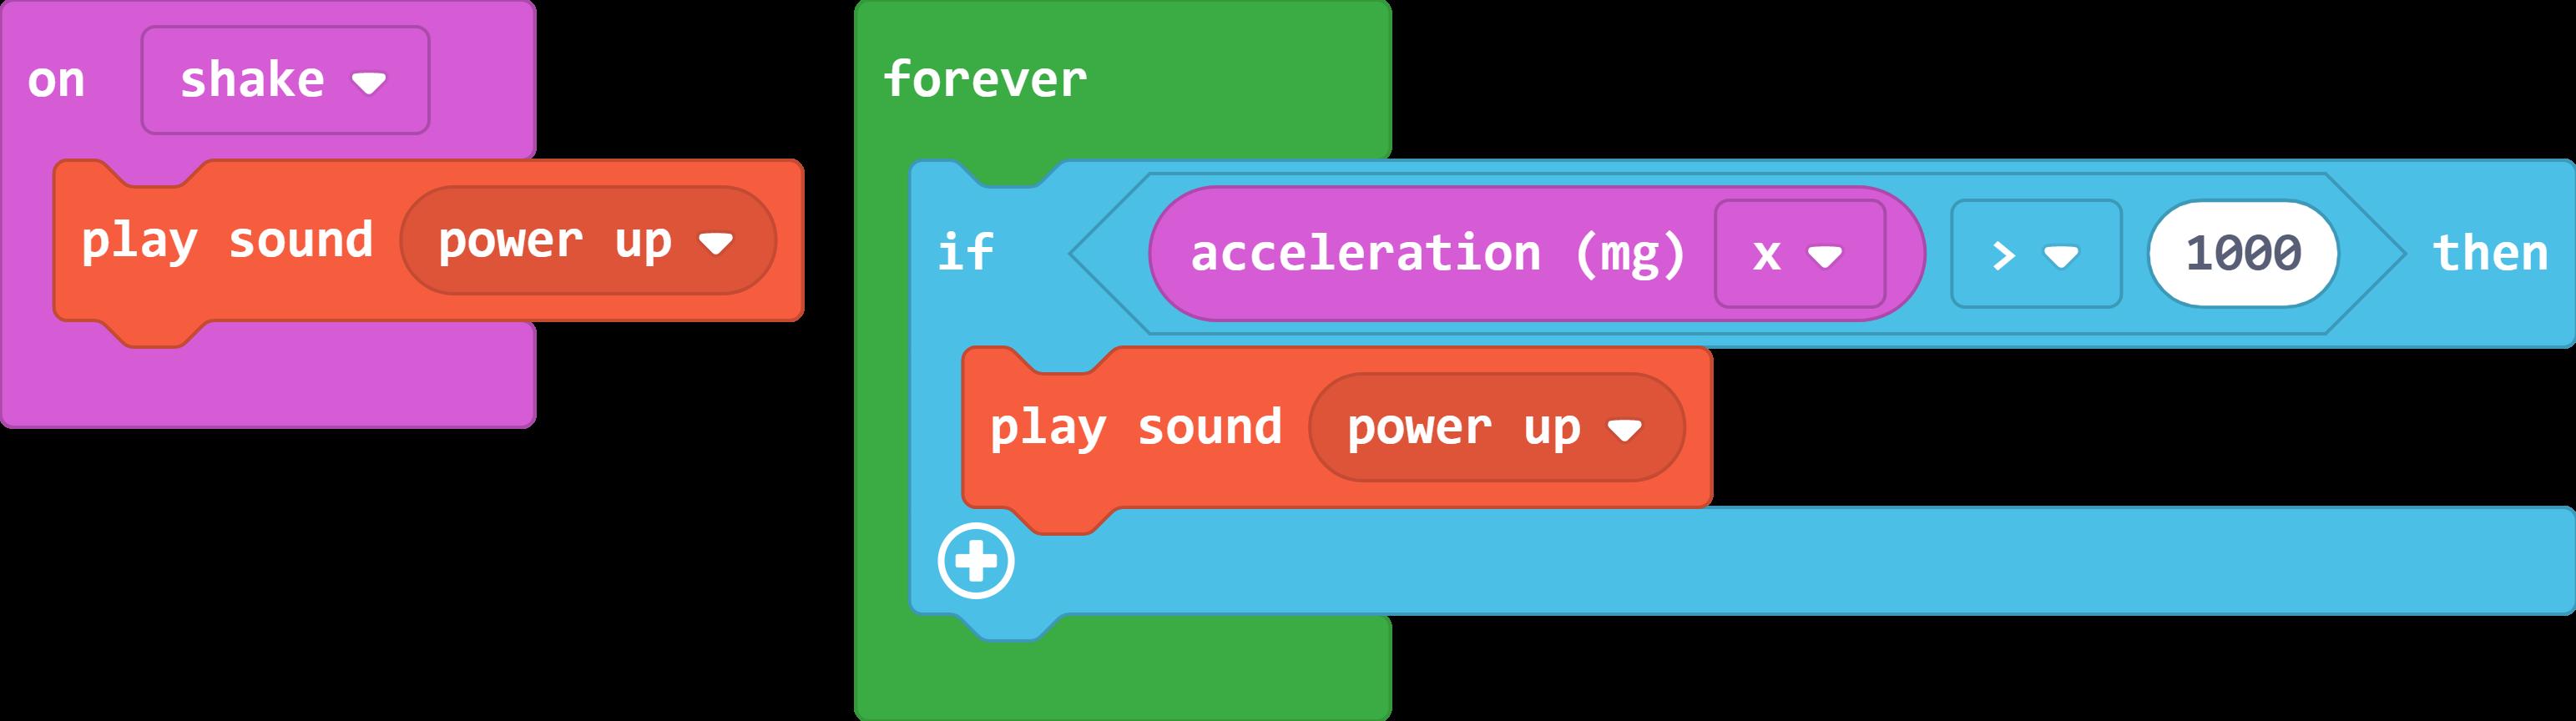 sensors_circuitplayground-screenshot.png